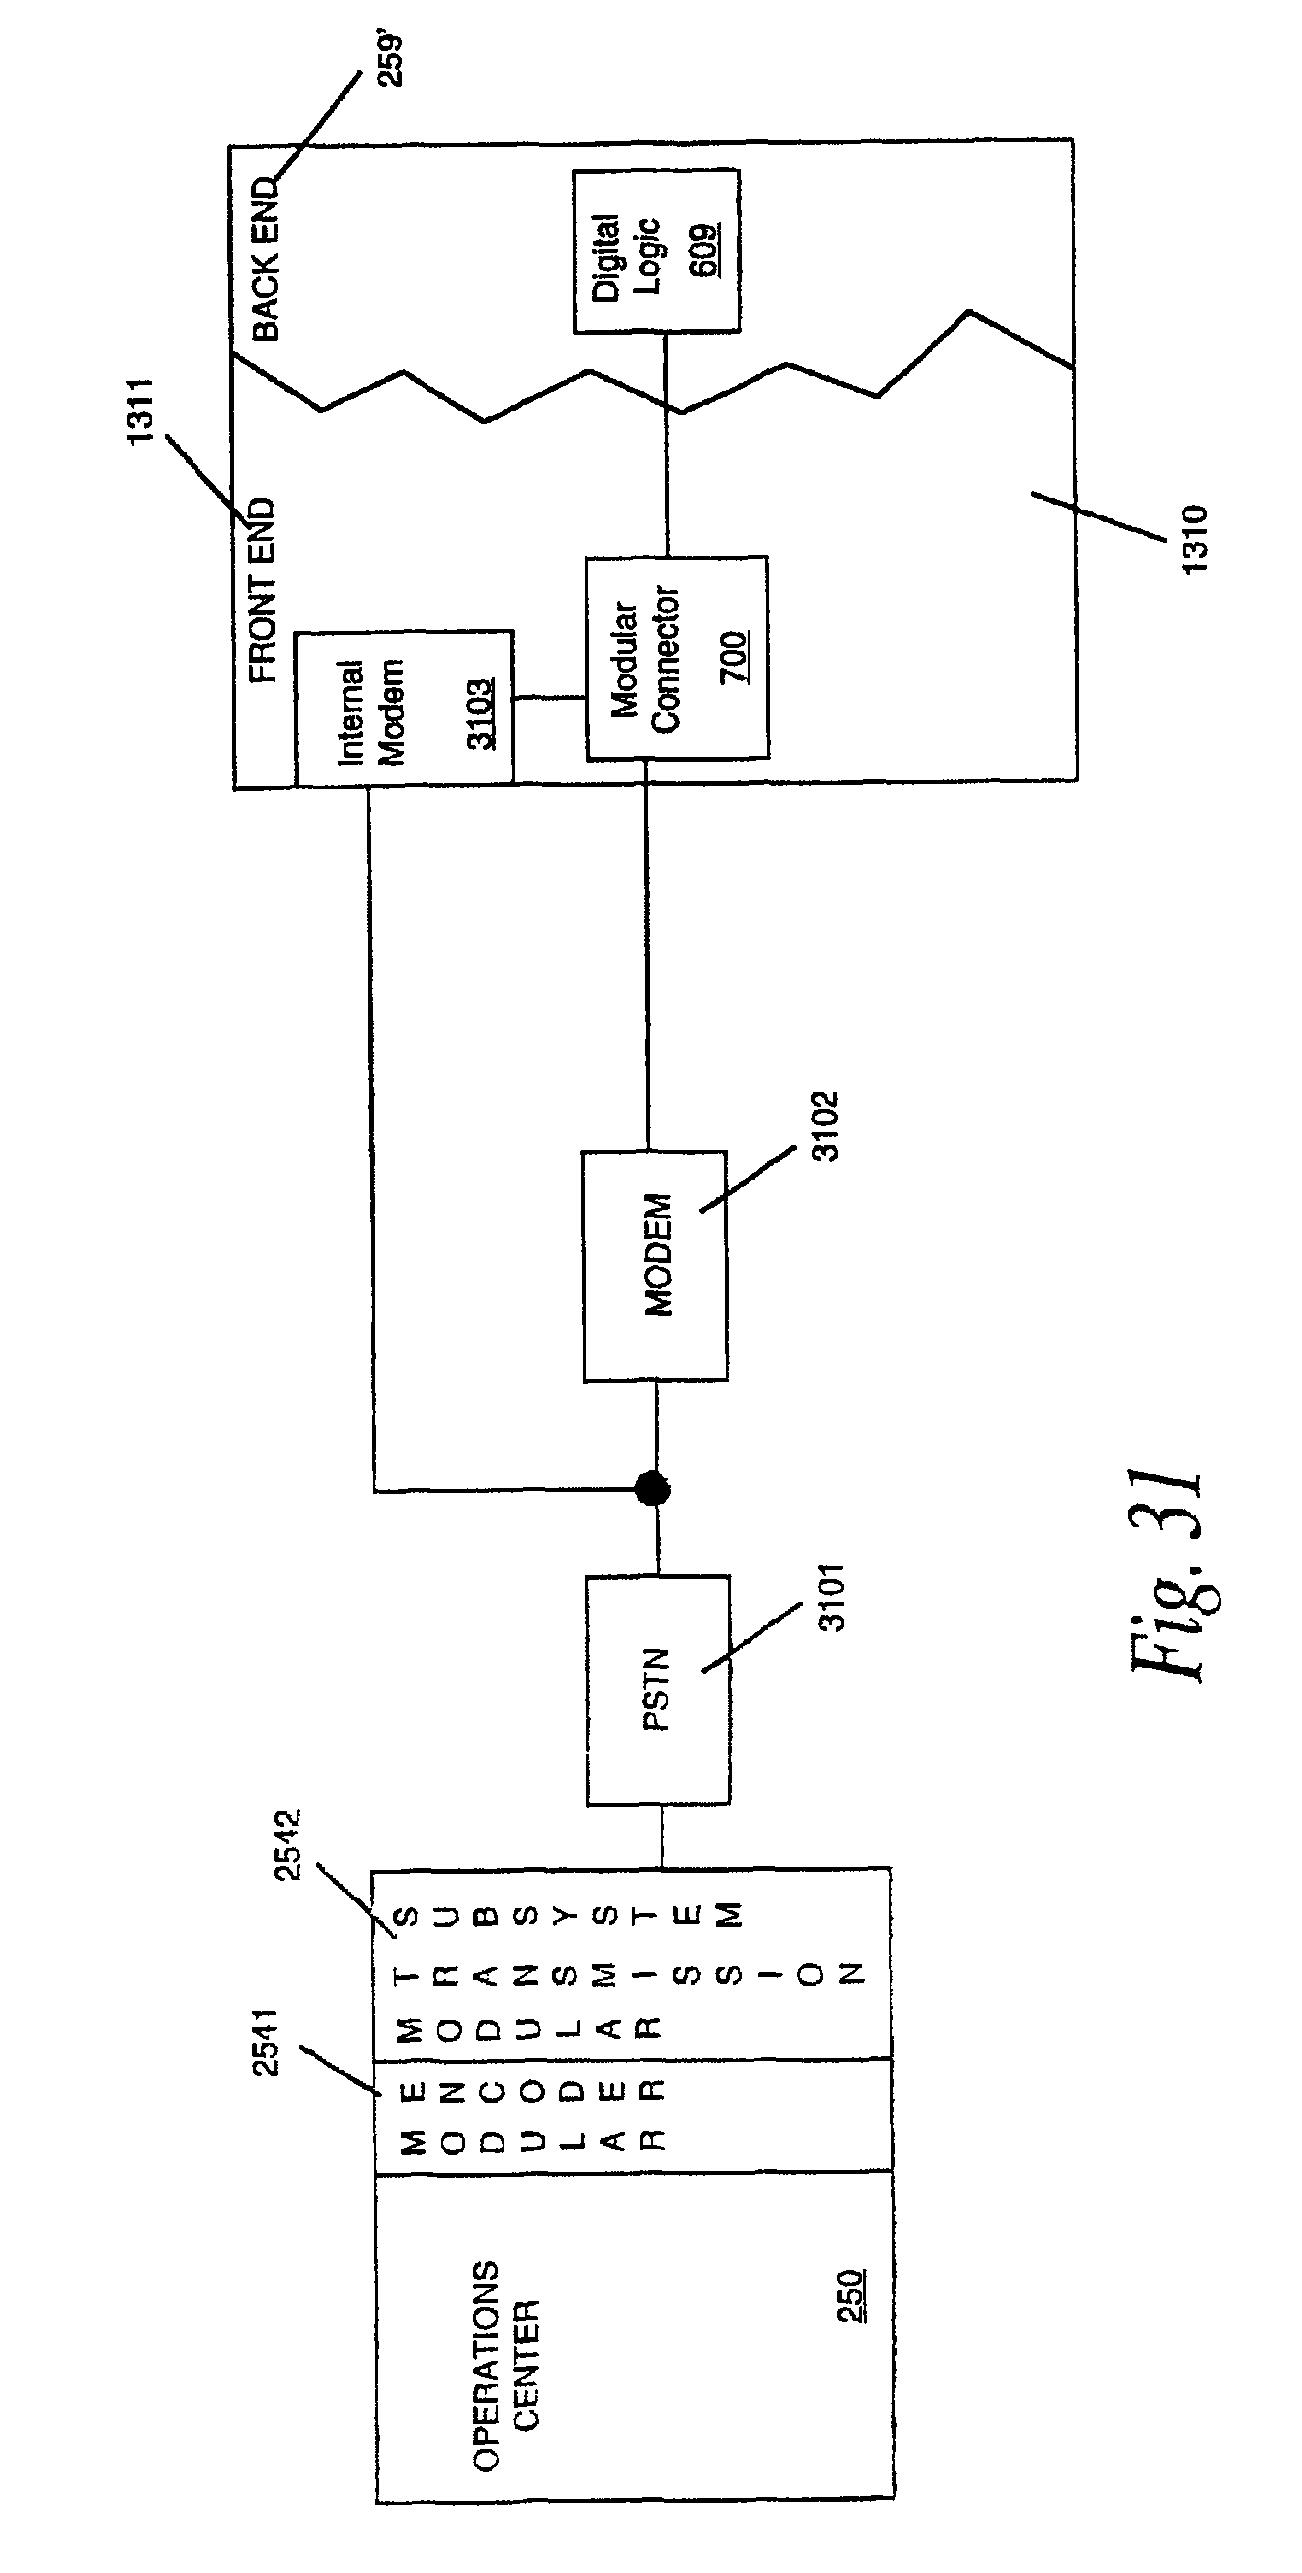 Patent US 7,865,405 B2